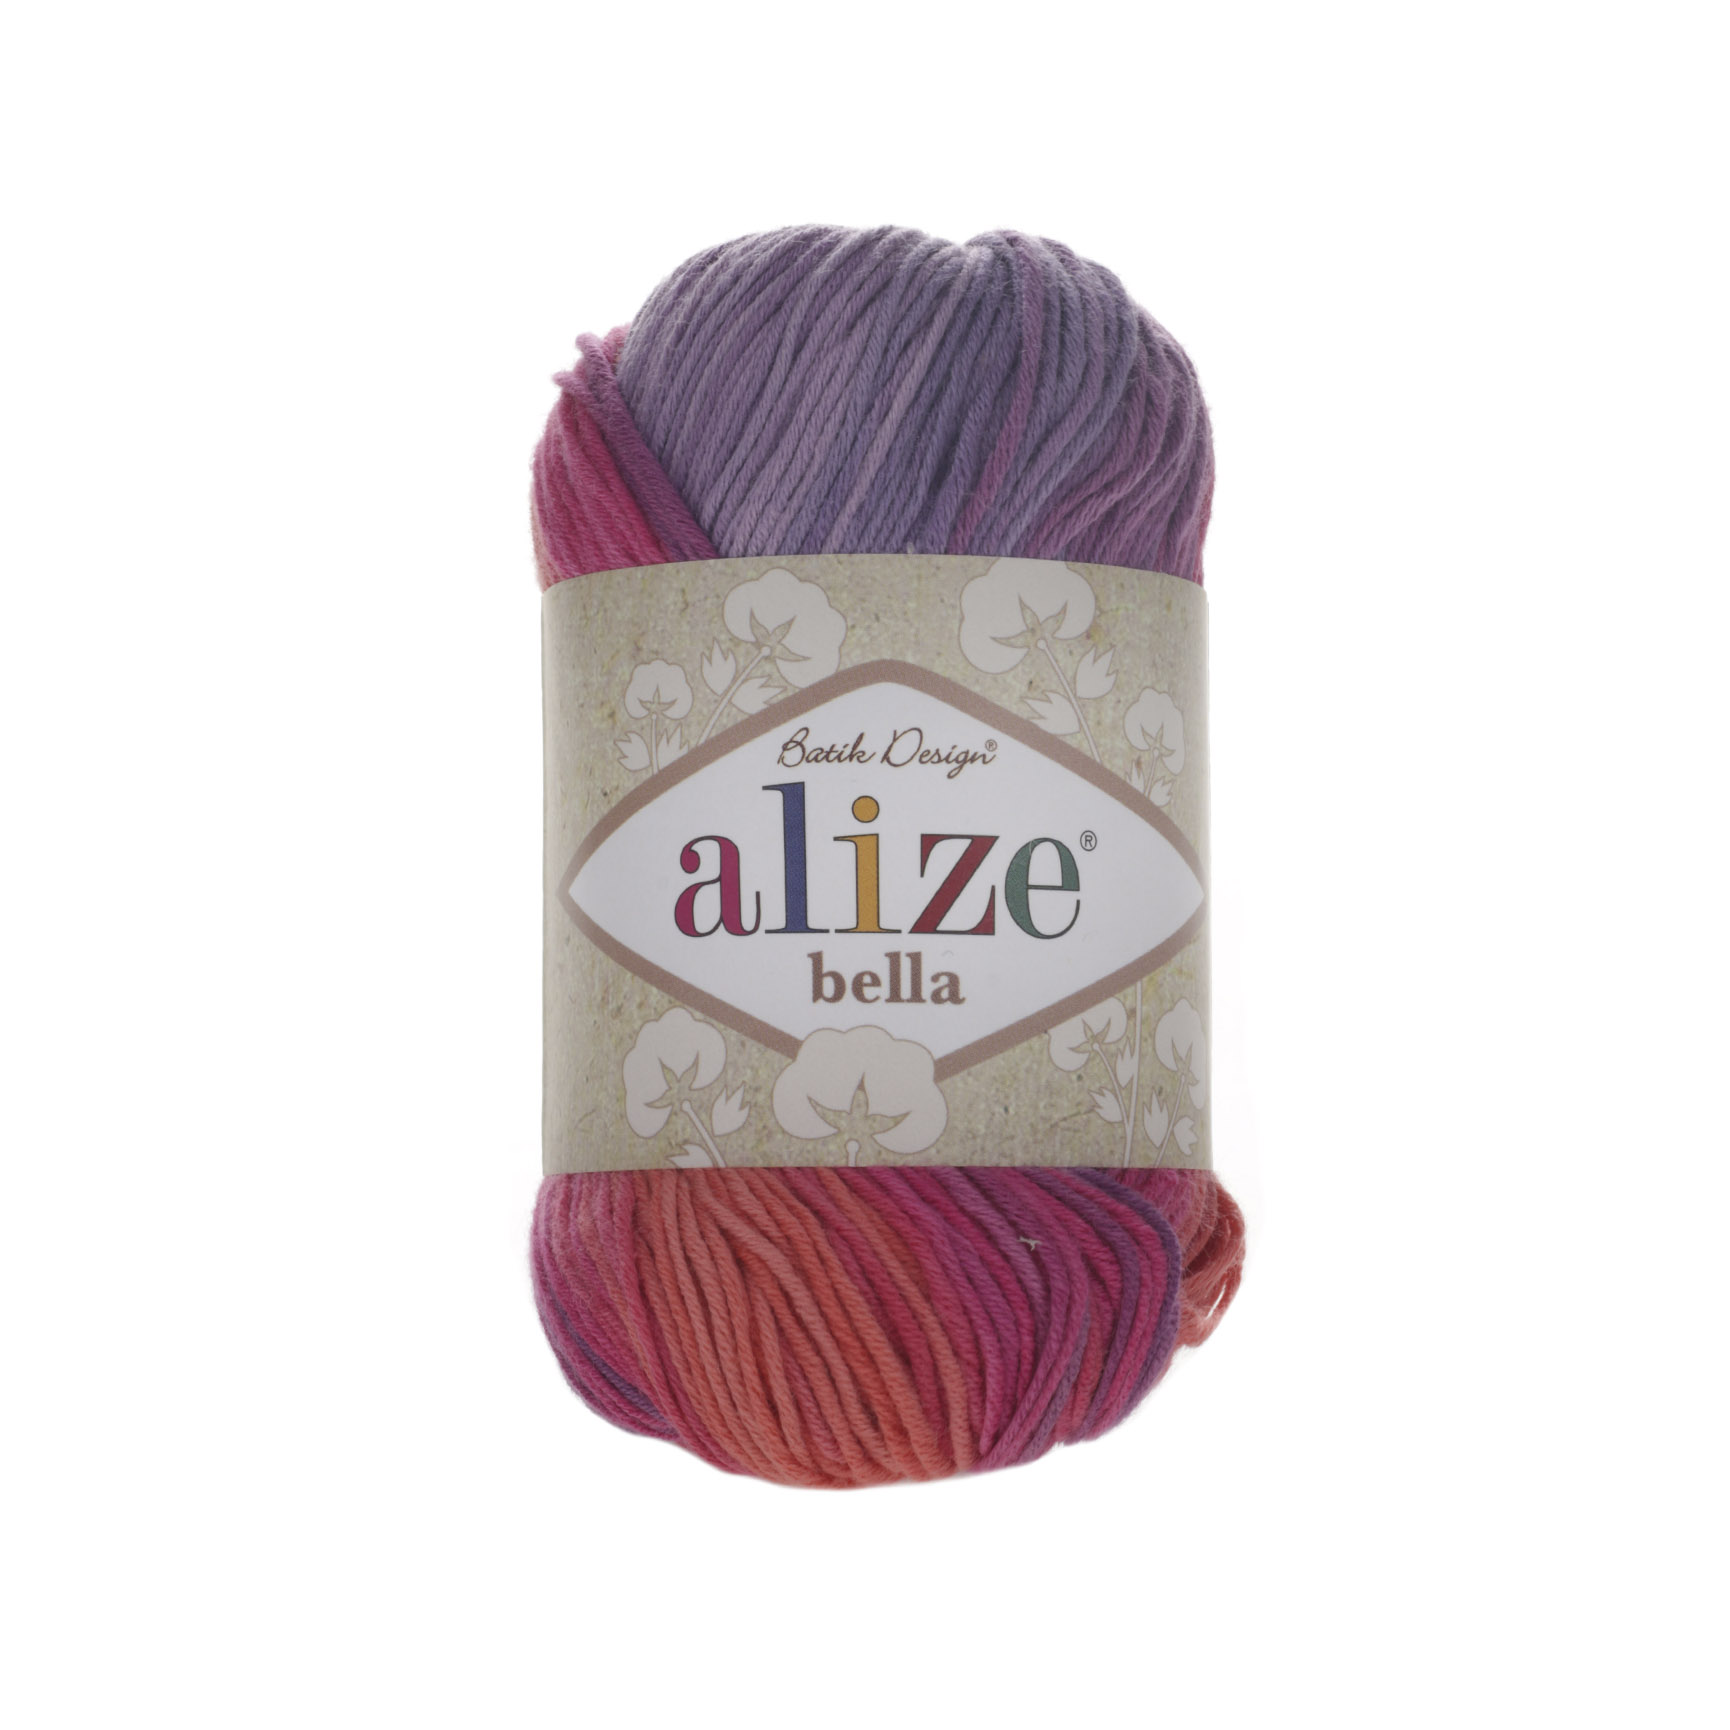 Alize Bella Batik Design Cod 4595-0